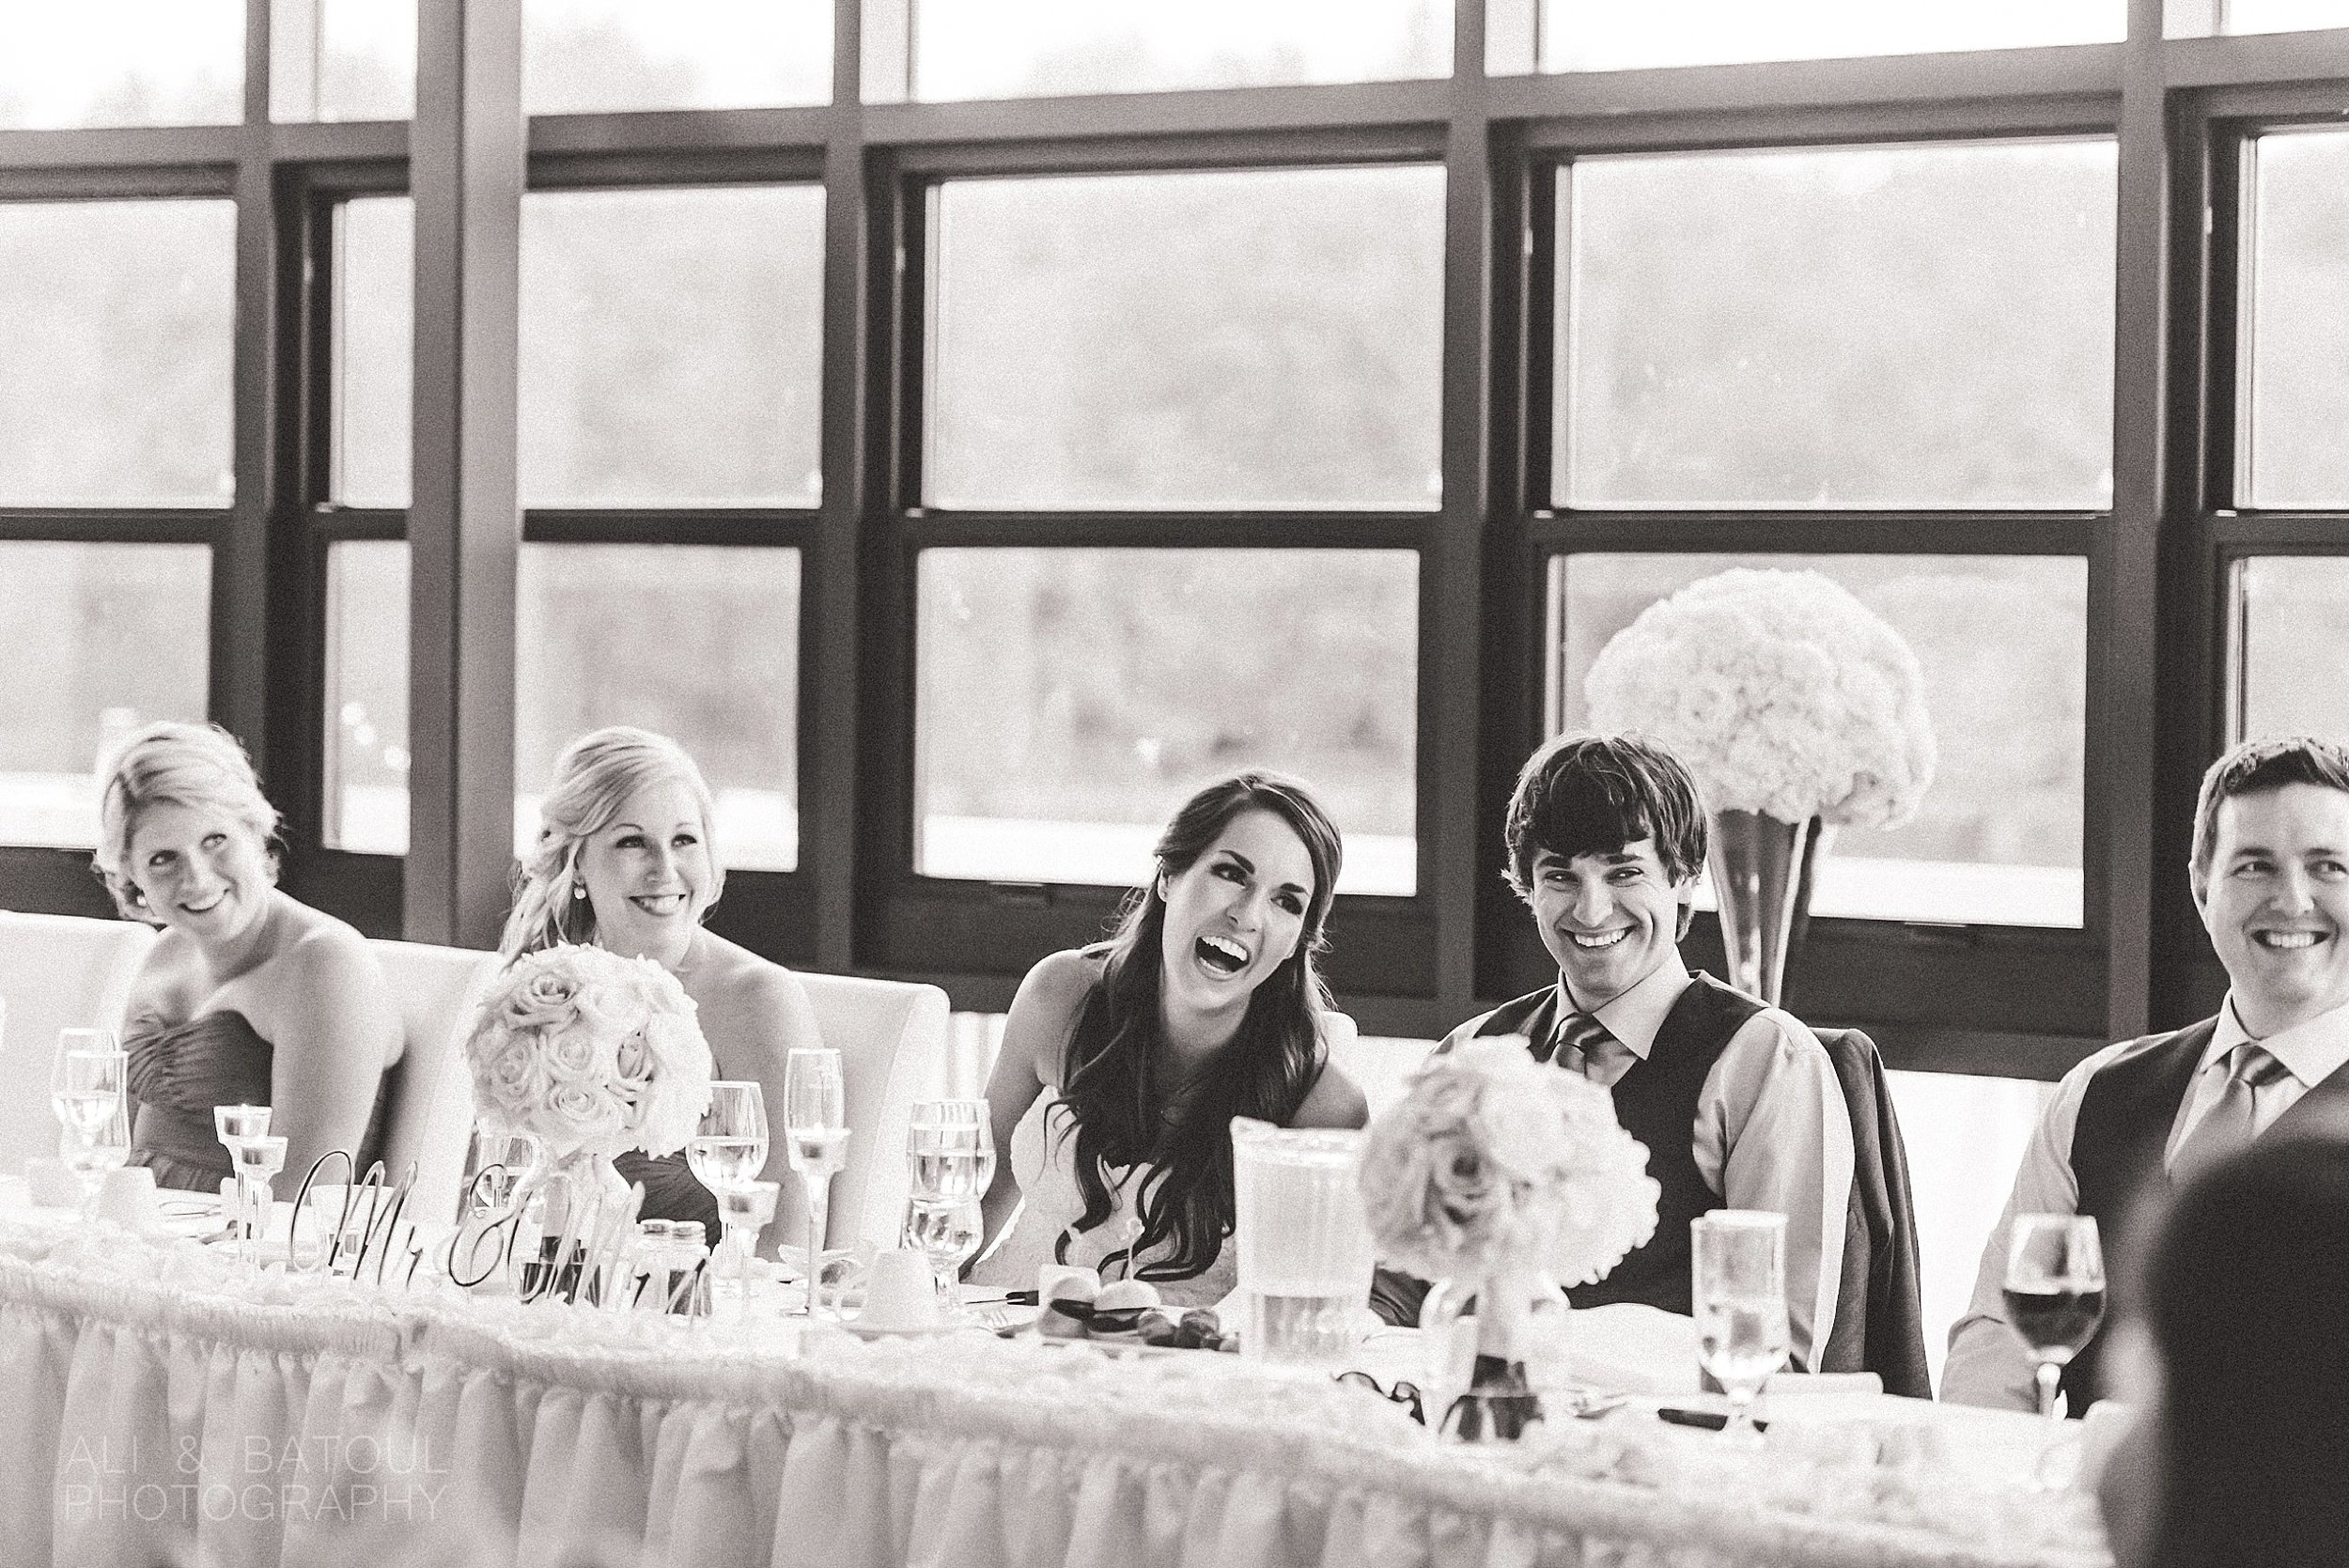 Ali & Batoul Photography - Documentary Fine Art Ottawa Wedding Photography_0088.jpg